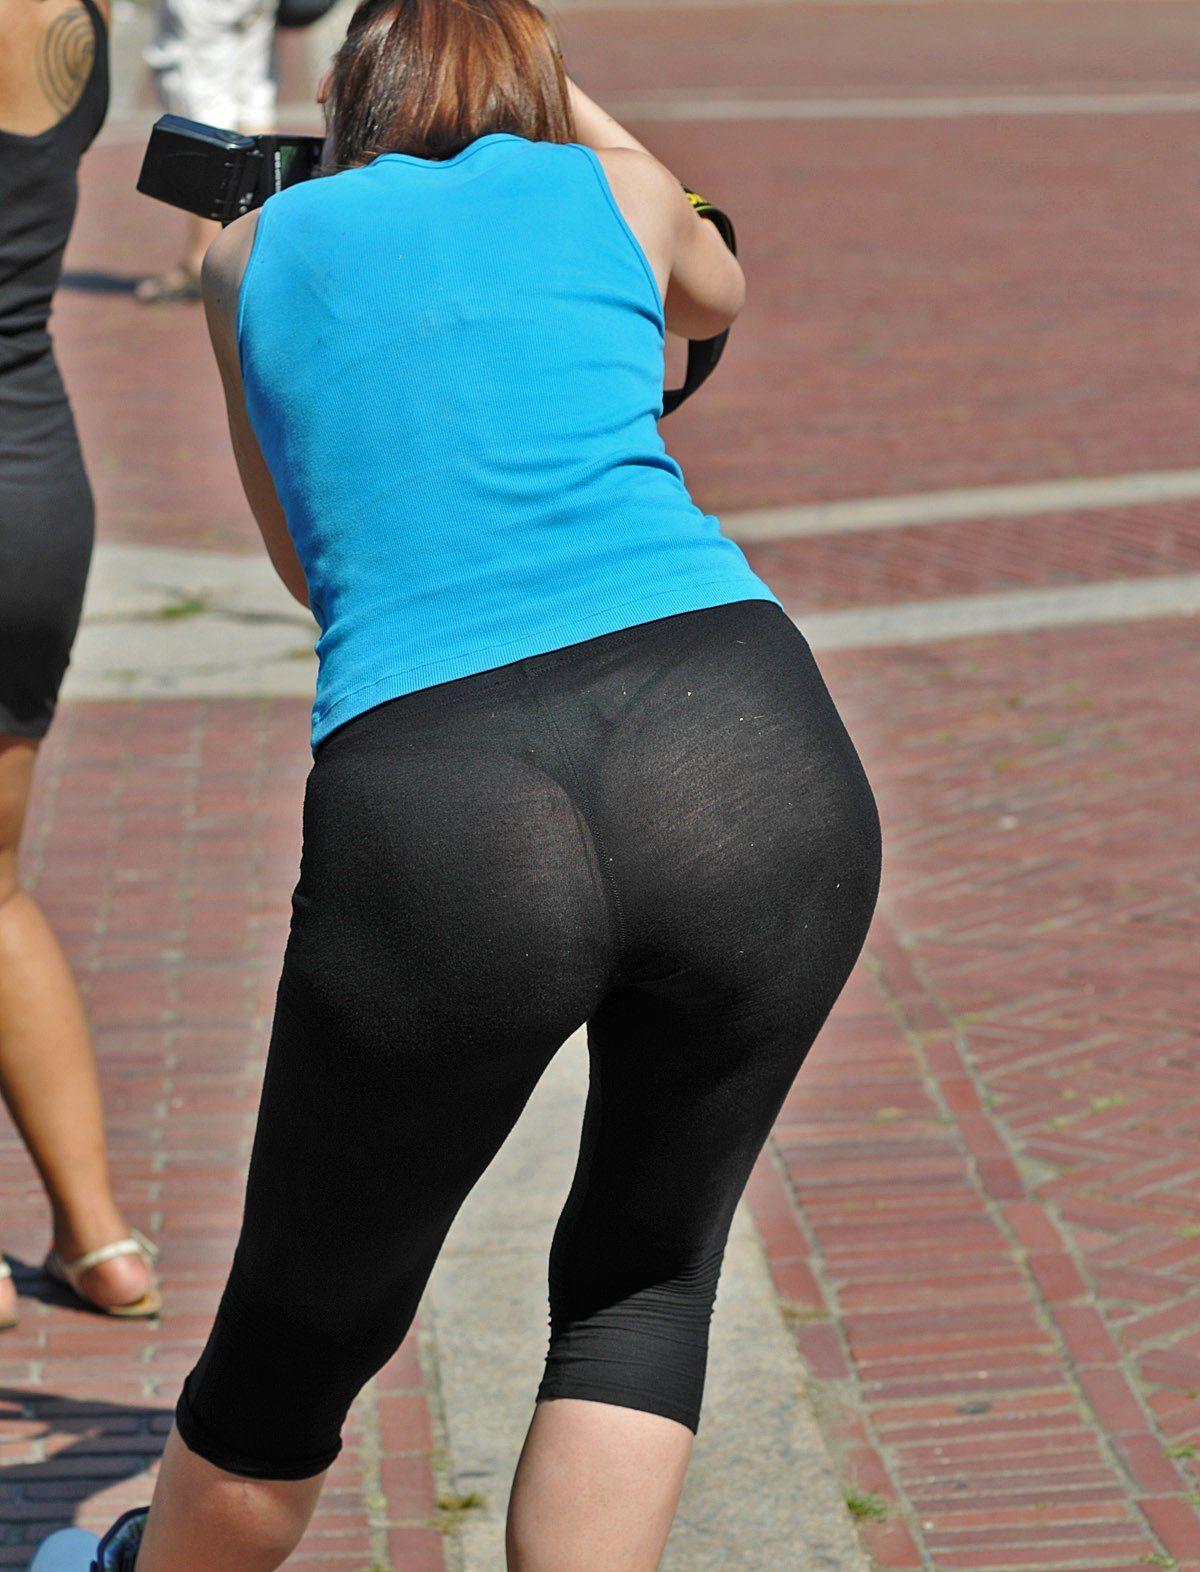 Yoga Pants And Thong : pants, thong, Leggings, Thongs